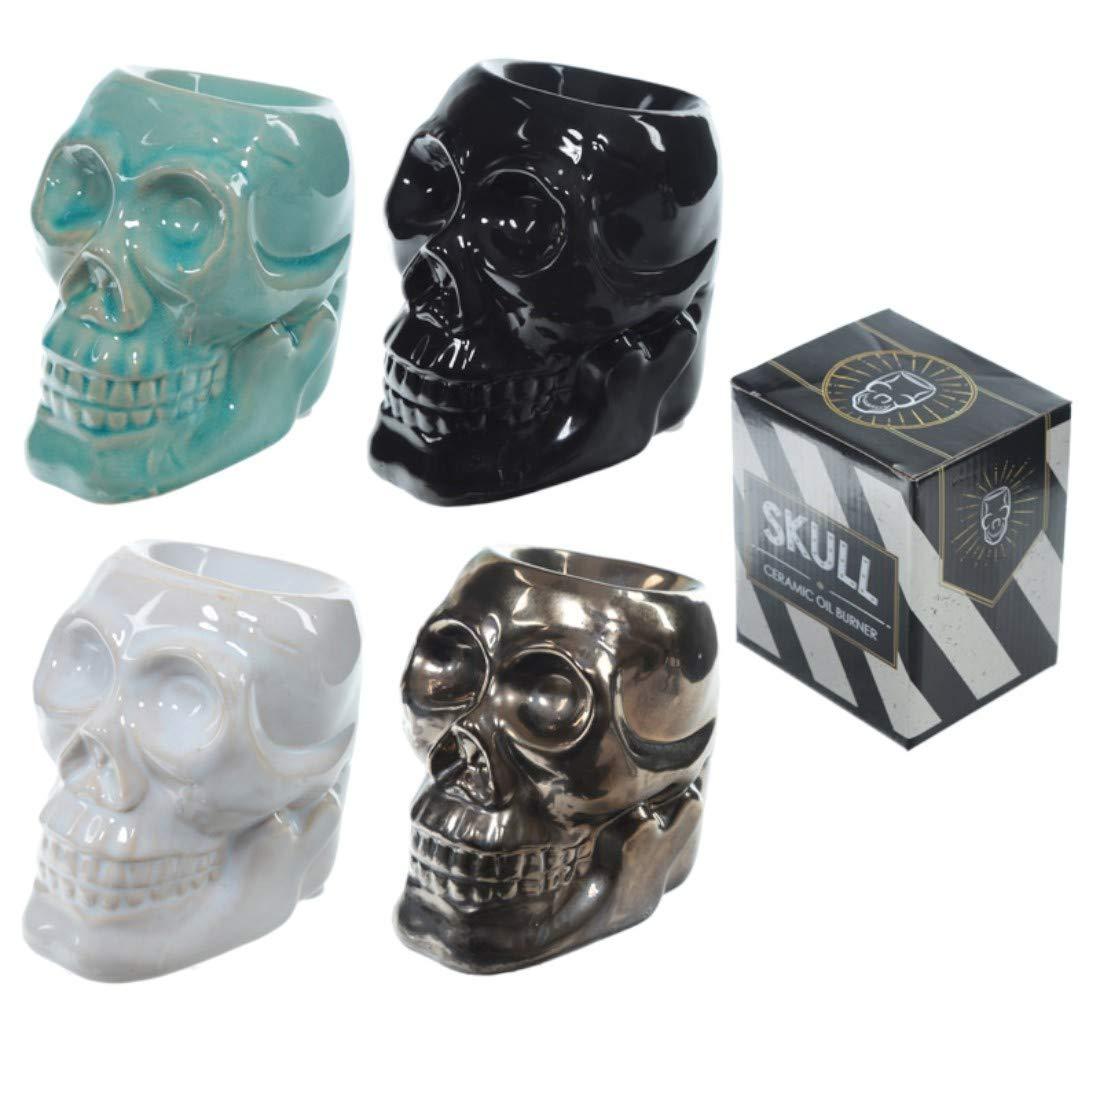 Novelty Skull Ceramic Oil Burner Puckator